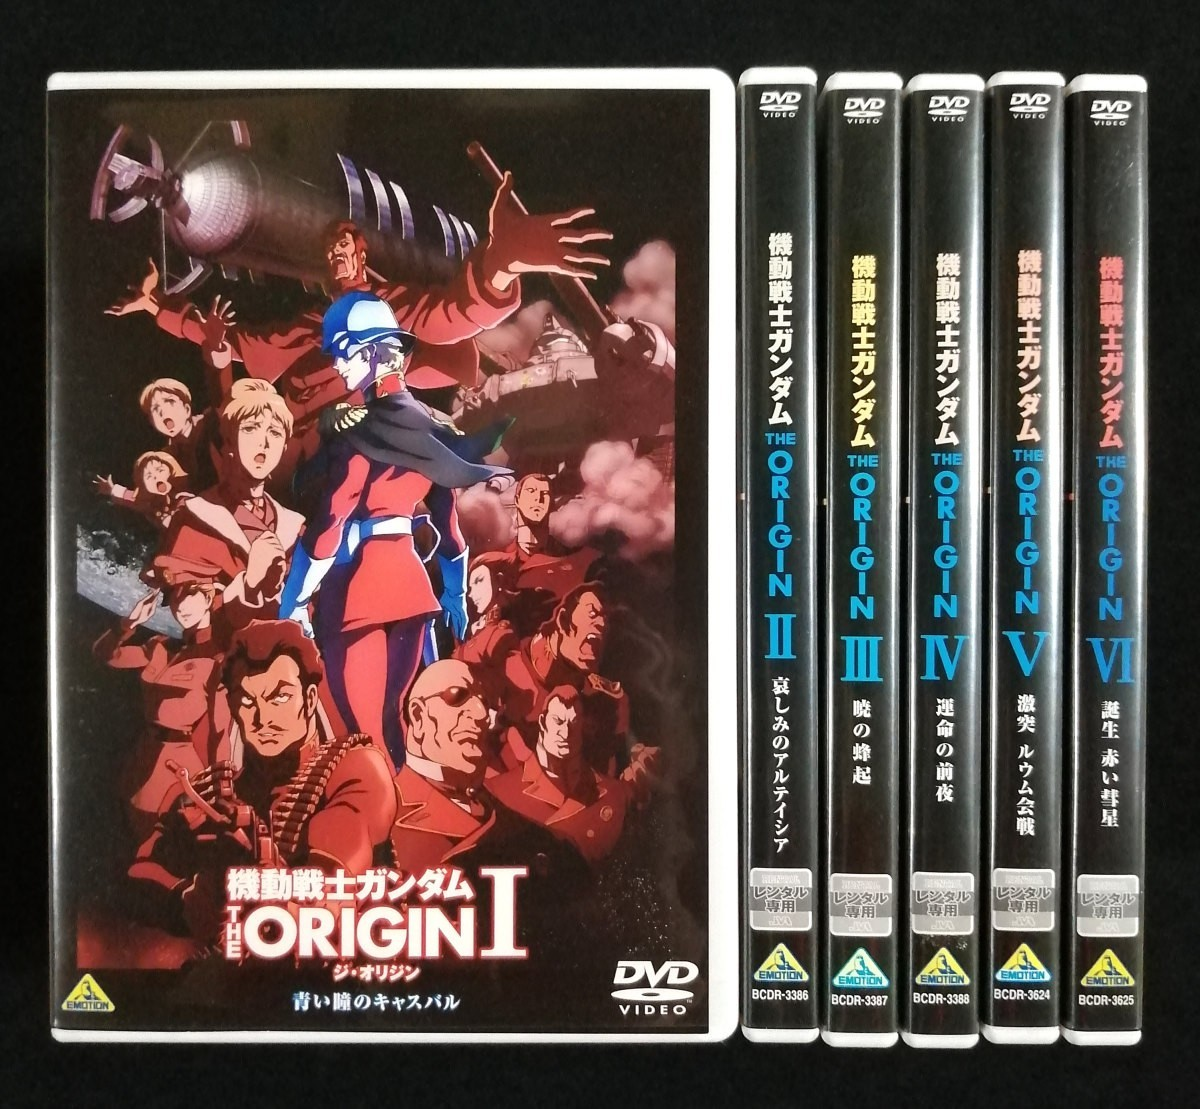 DVD 機動戦士ガンダム THE ORIGIN 全6巻セット レンタル版